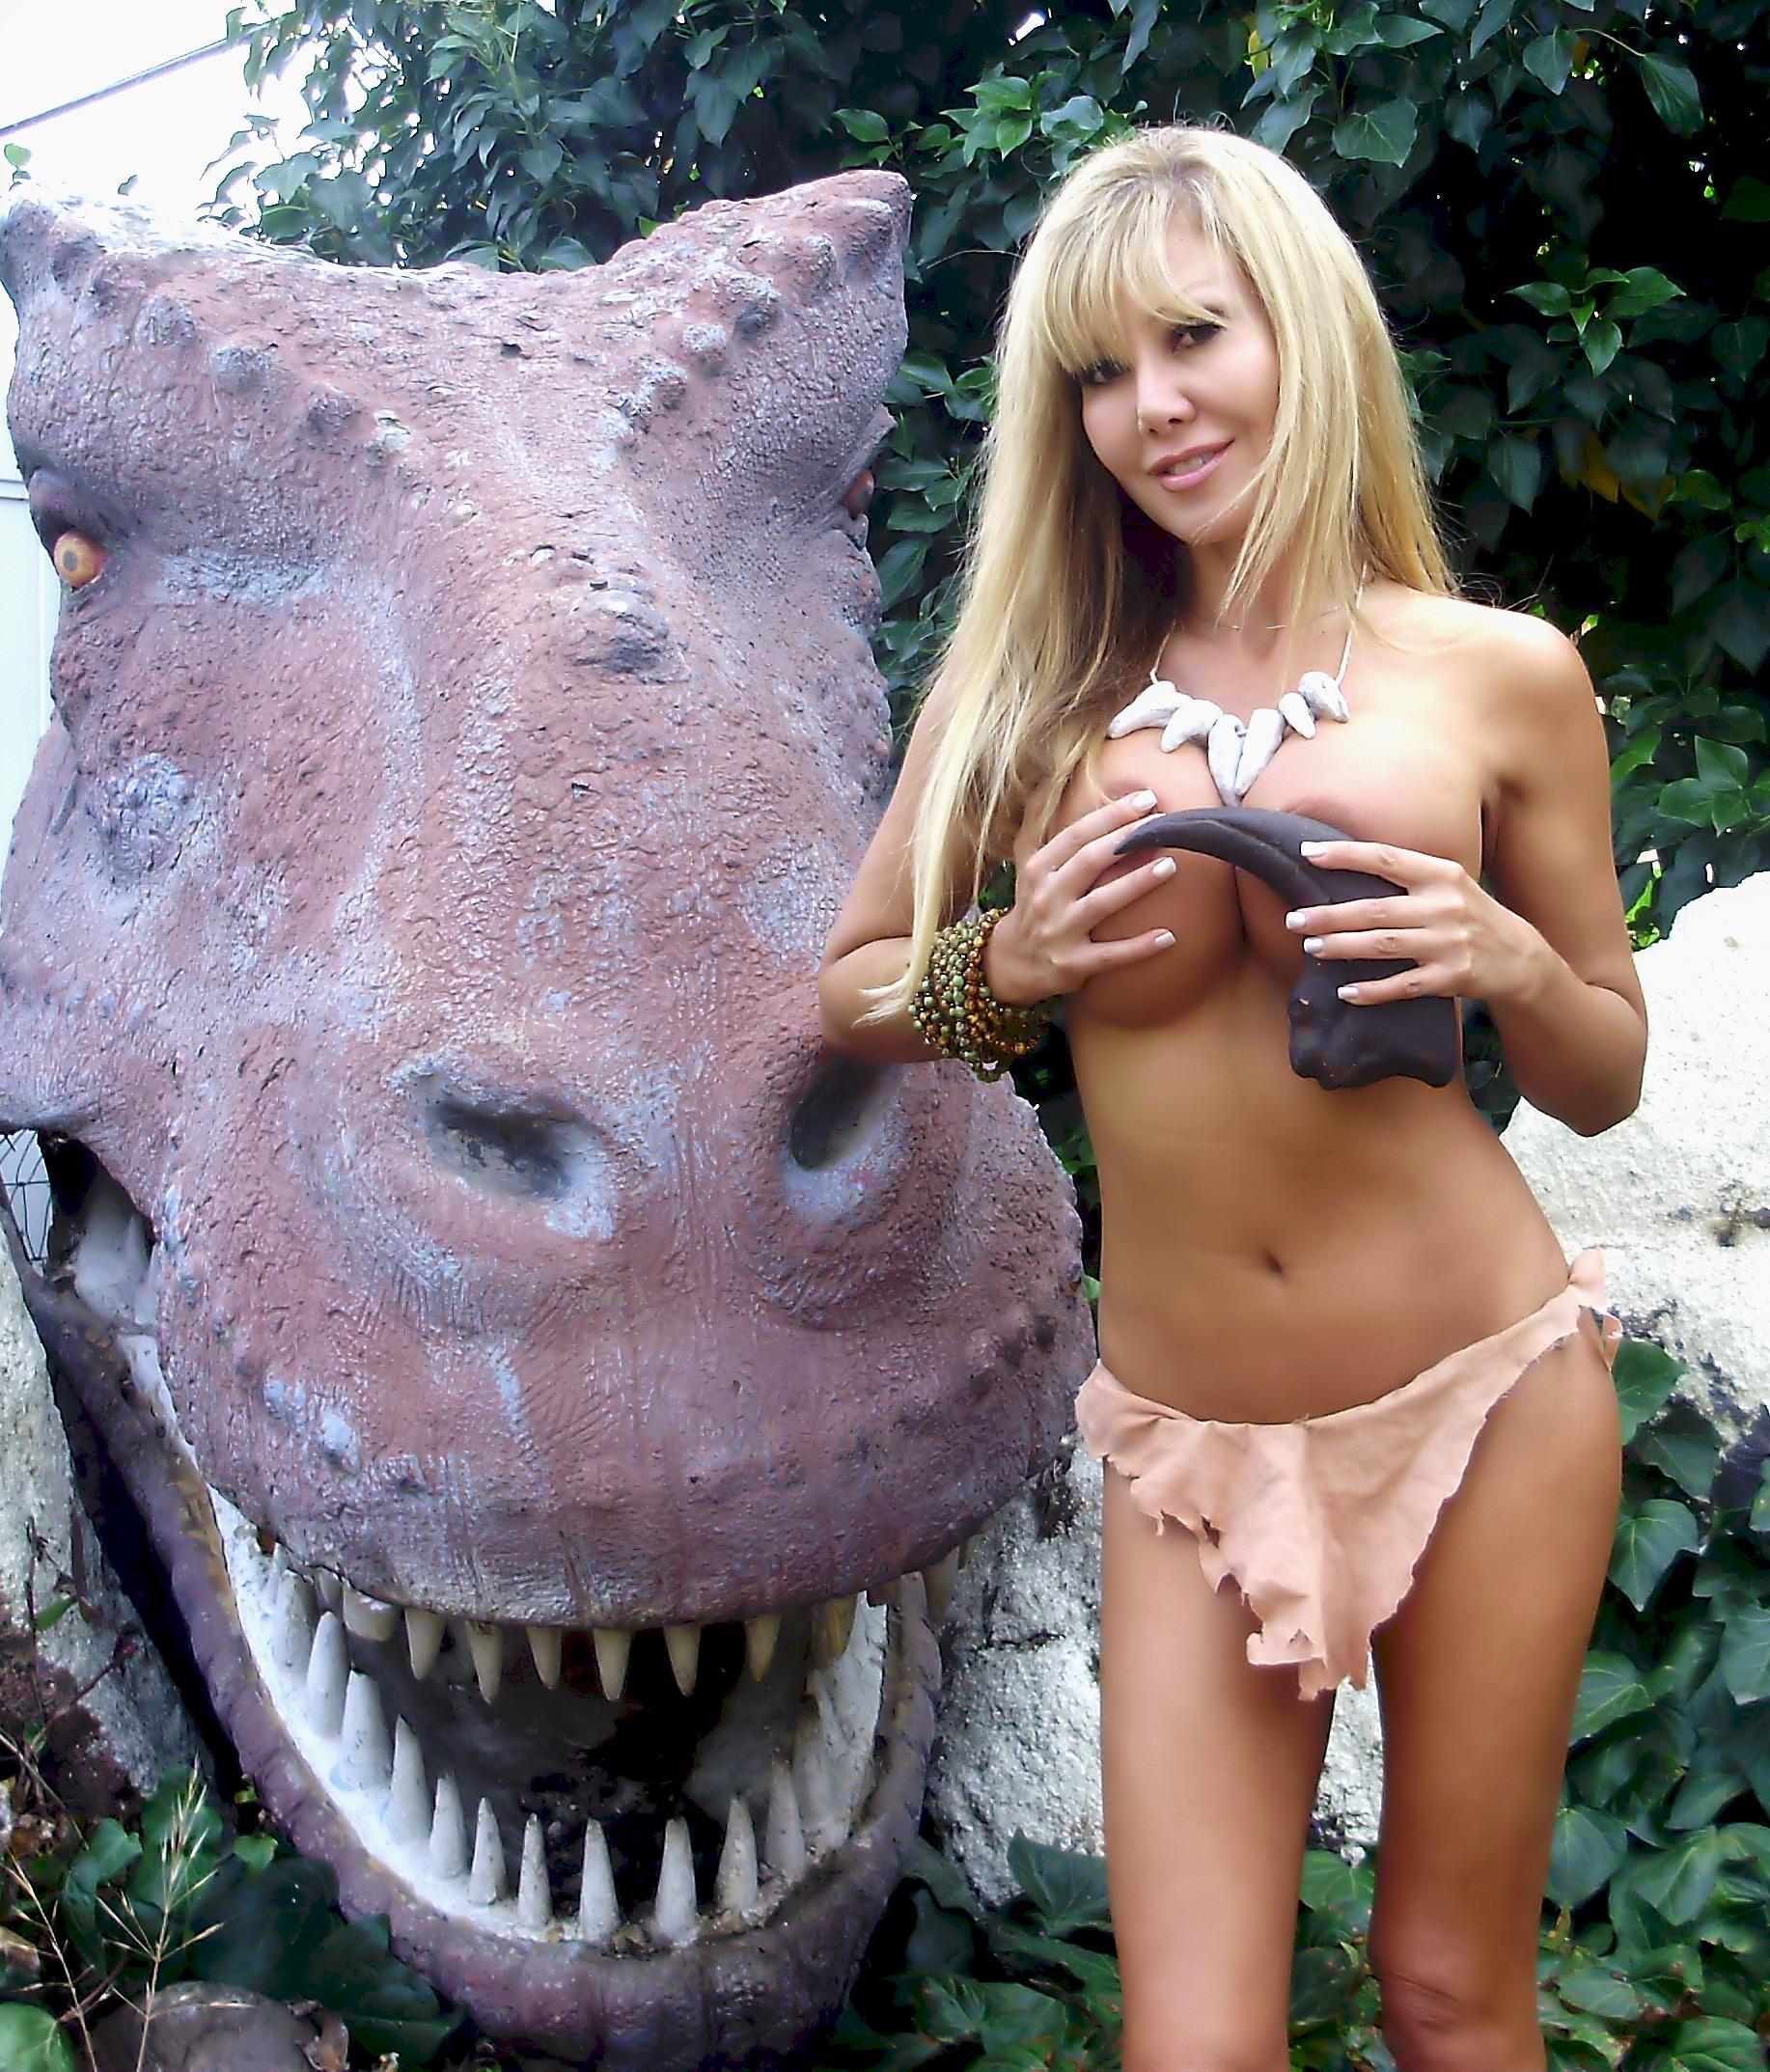 http://donglutsdinosaurs.com/wp-content/uploads/2014/09/Jonas-head1.jpg